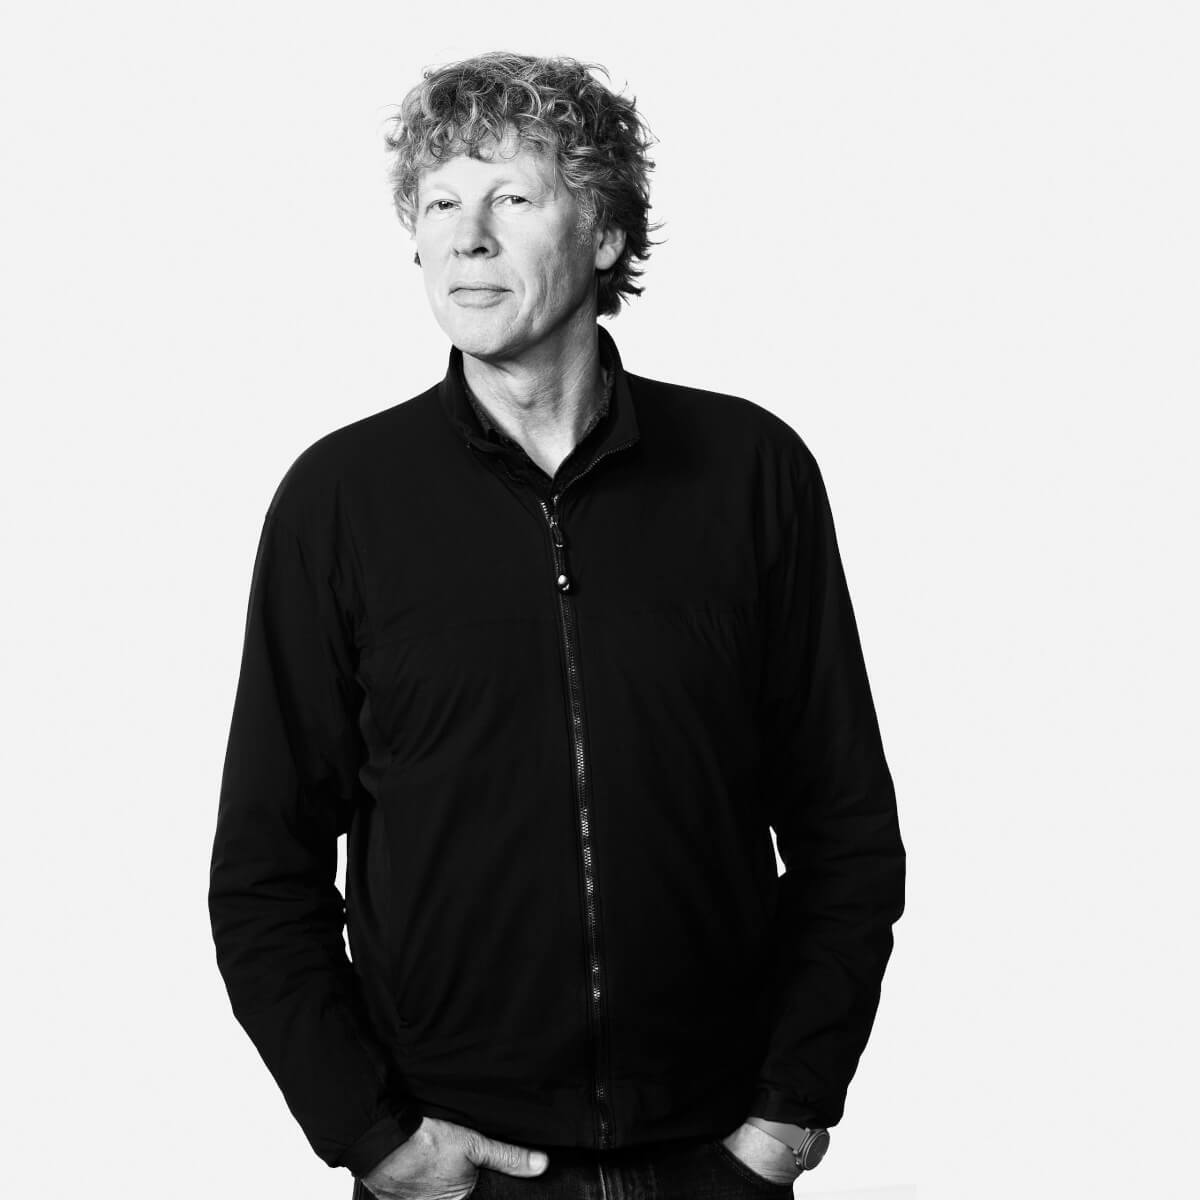 jonas briels fotografie amsterdam zakelijk portret corporate portrait